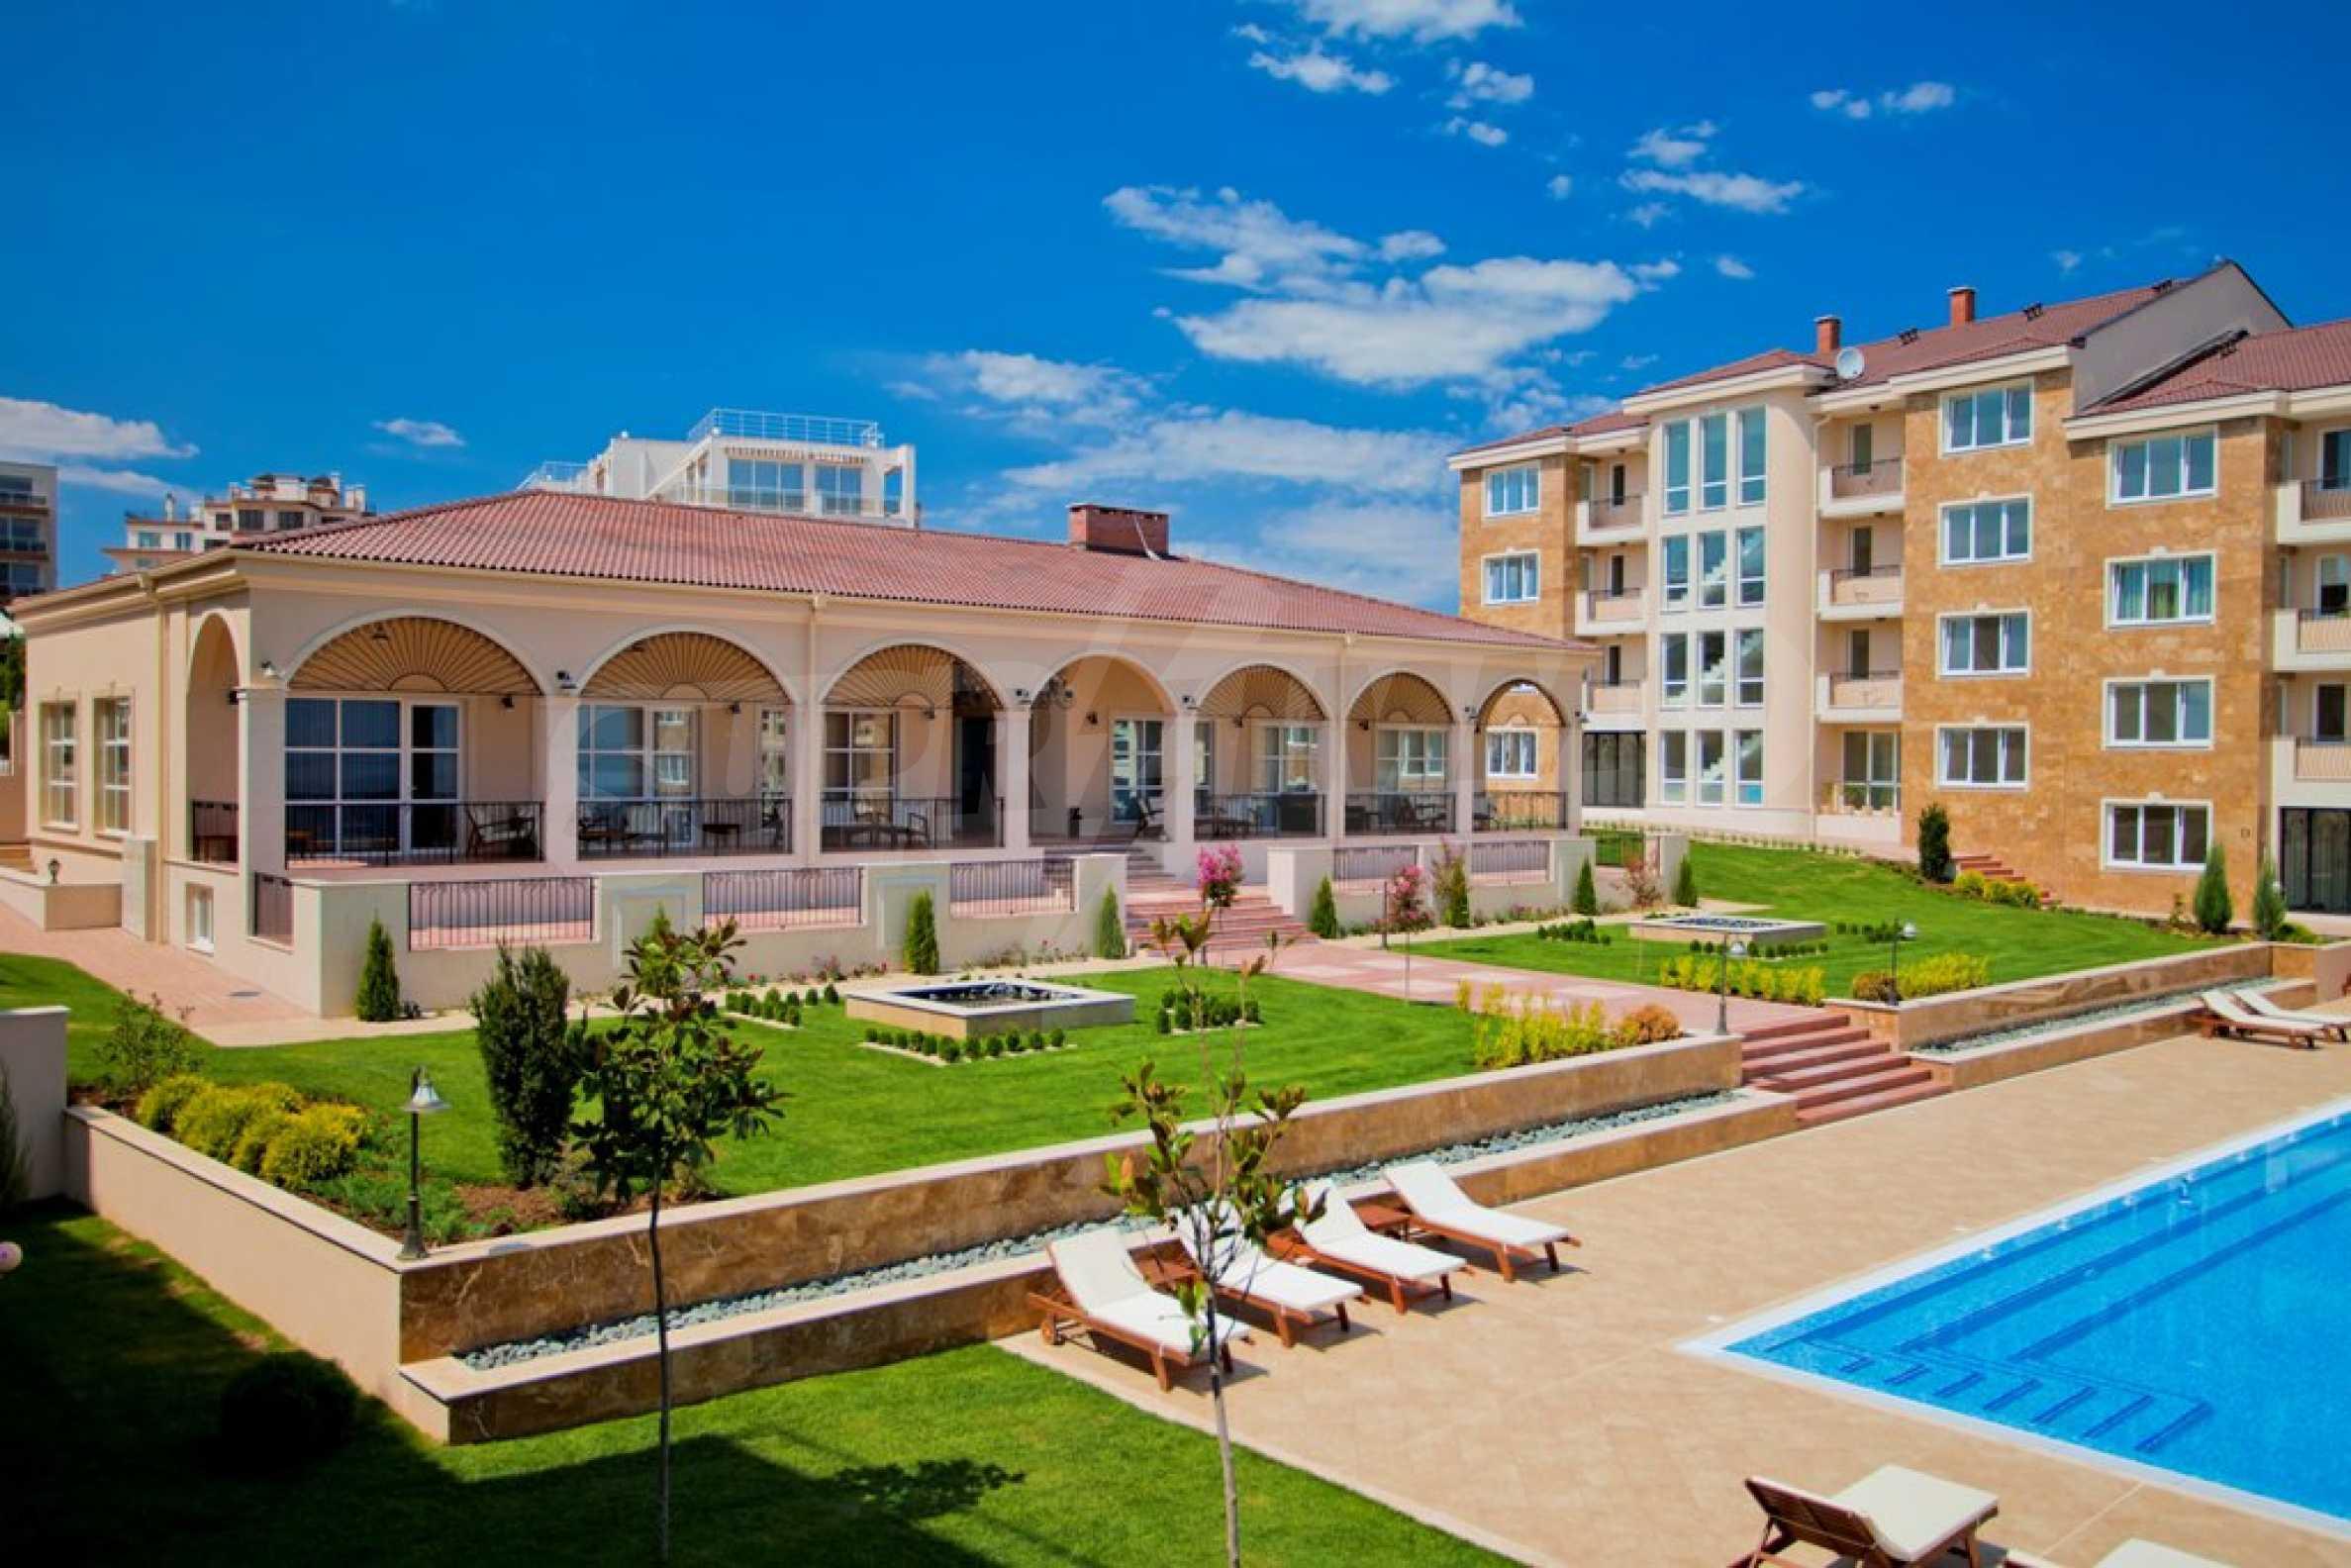 New apartment complex Atia resort in Chernomorets 4